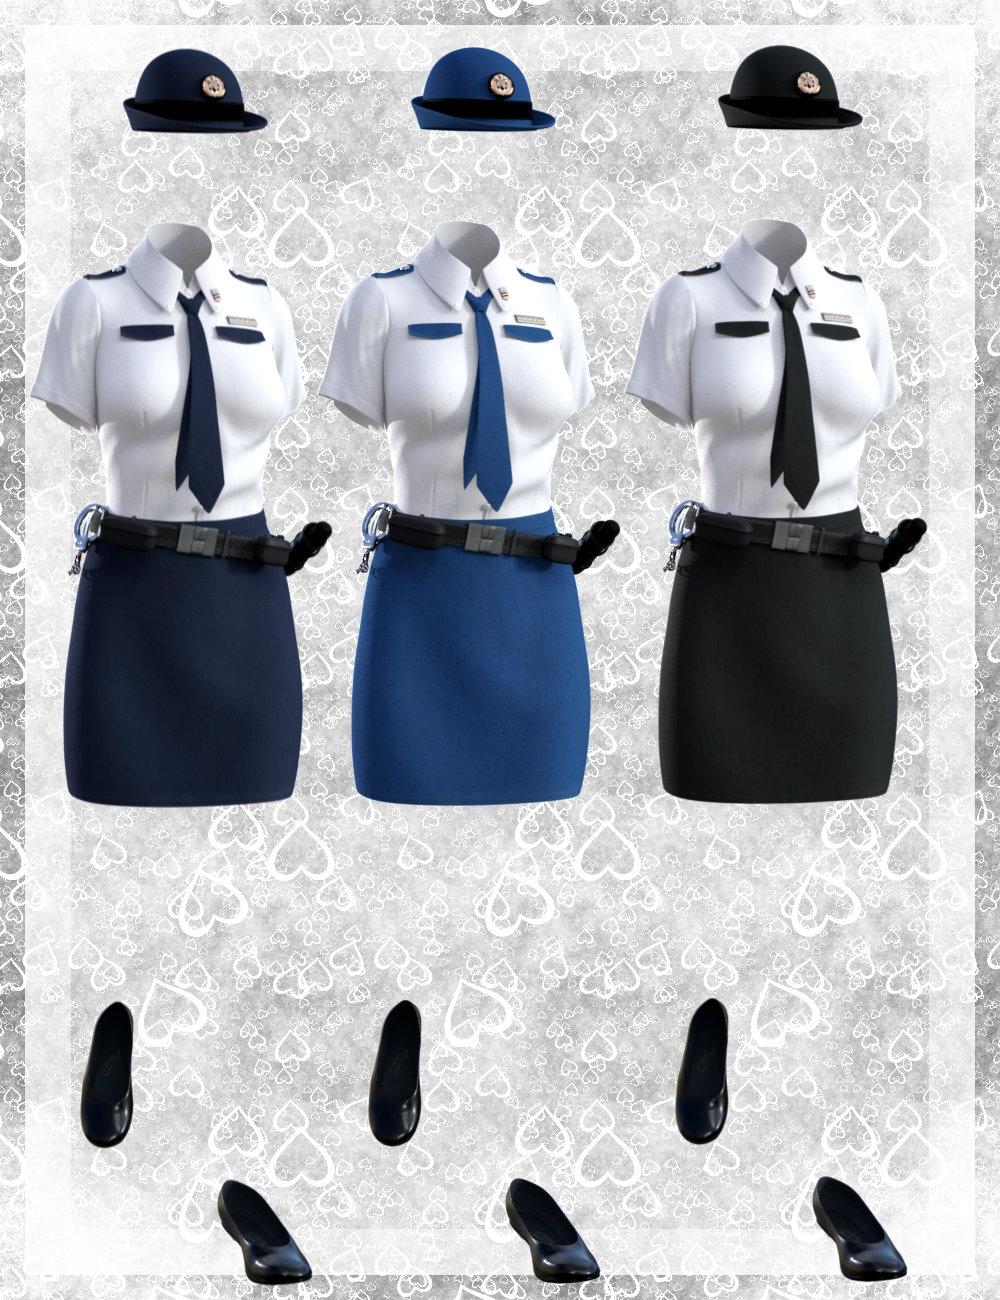 dForce Police Uniform for Genesis 8 Female(s) by: tentman, 3D Models by Daz 3D